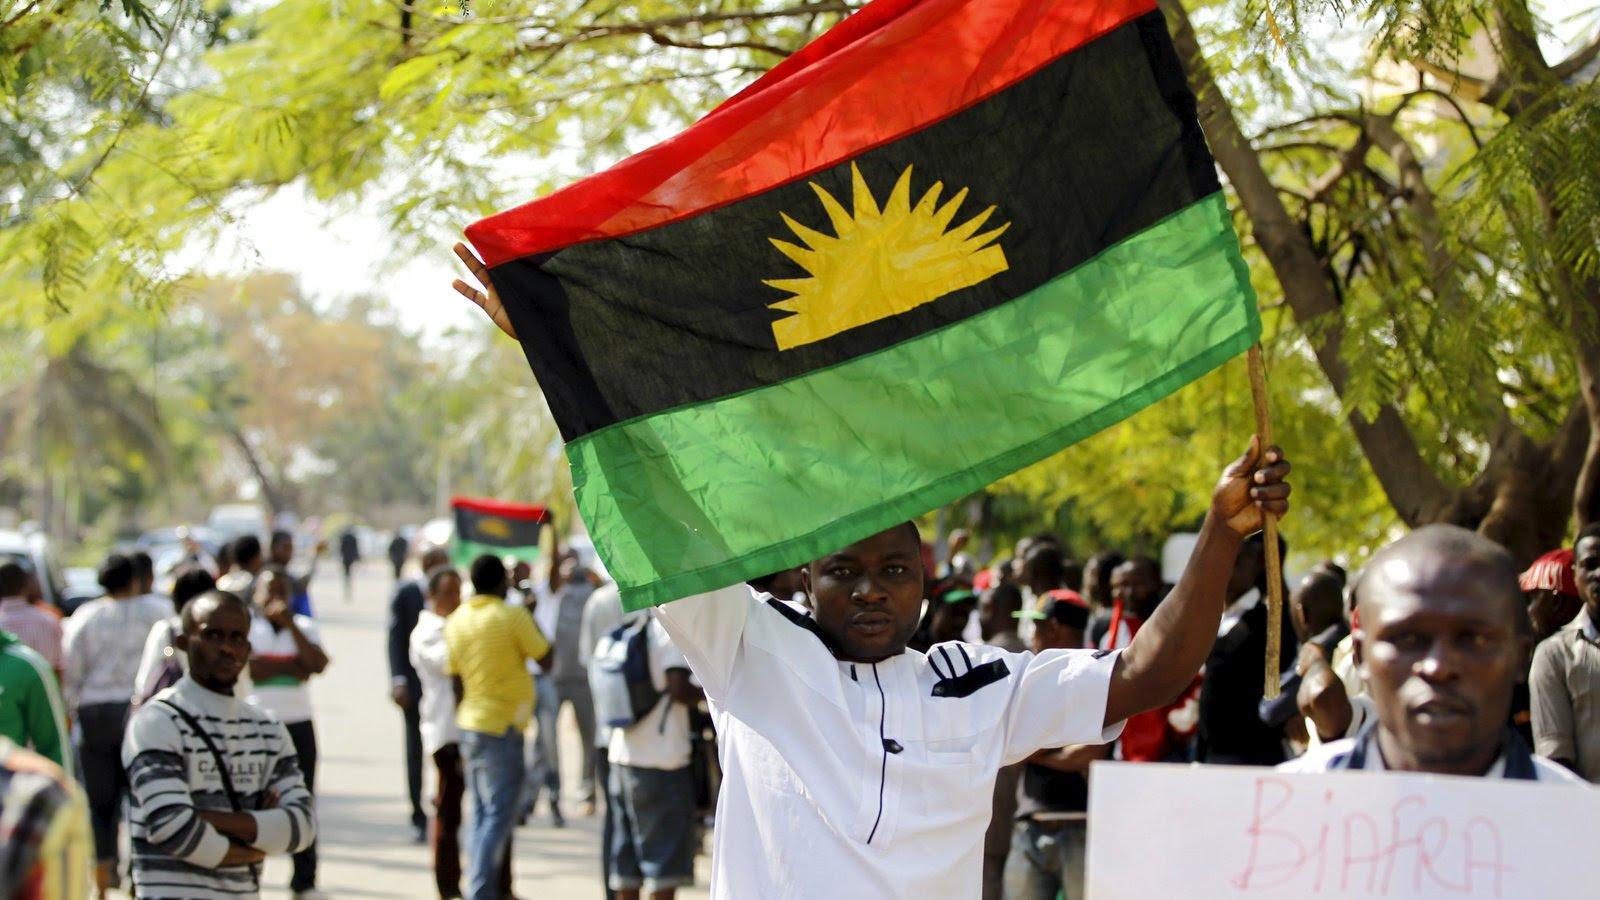 [GIST] Biafran Struggle Now On Autopilot – Sacked IPOB Radio Host, Simon Ekpa